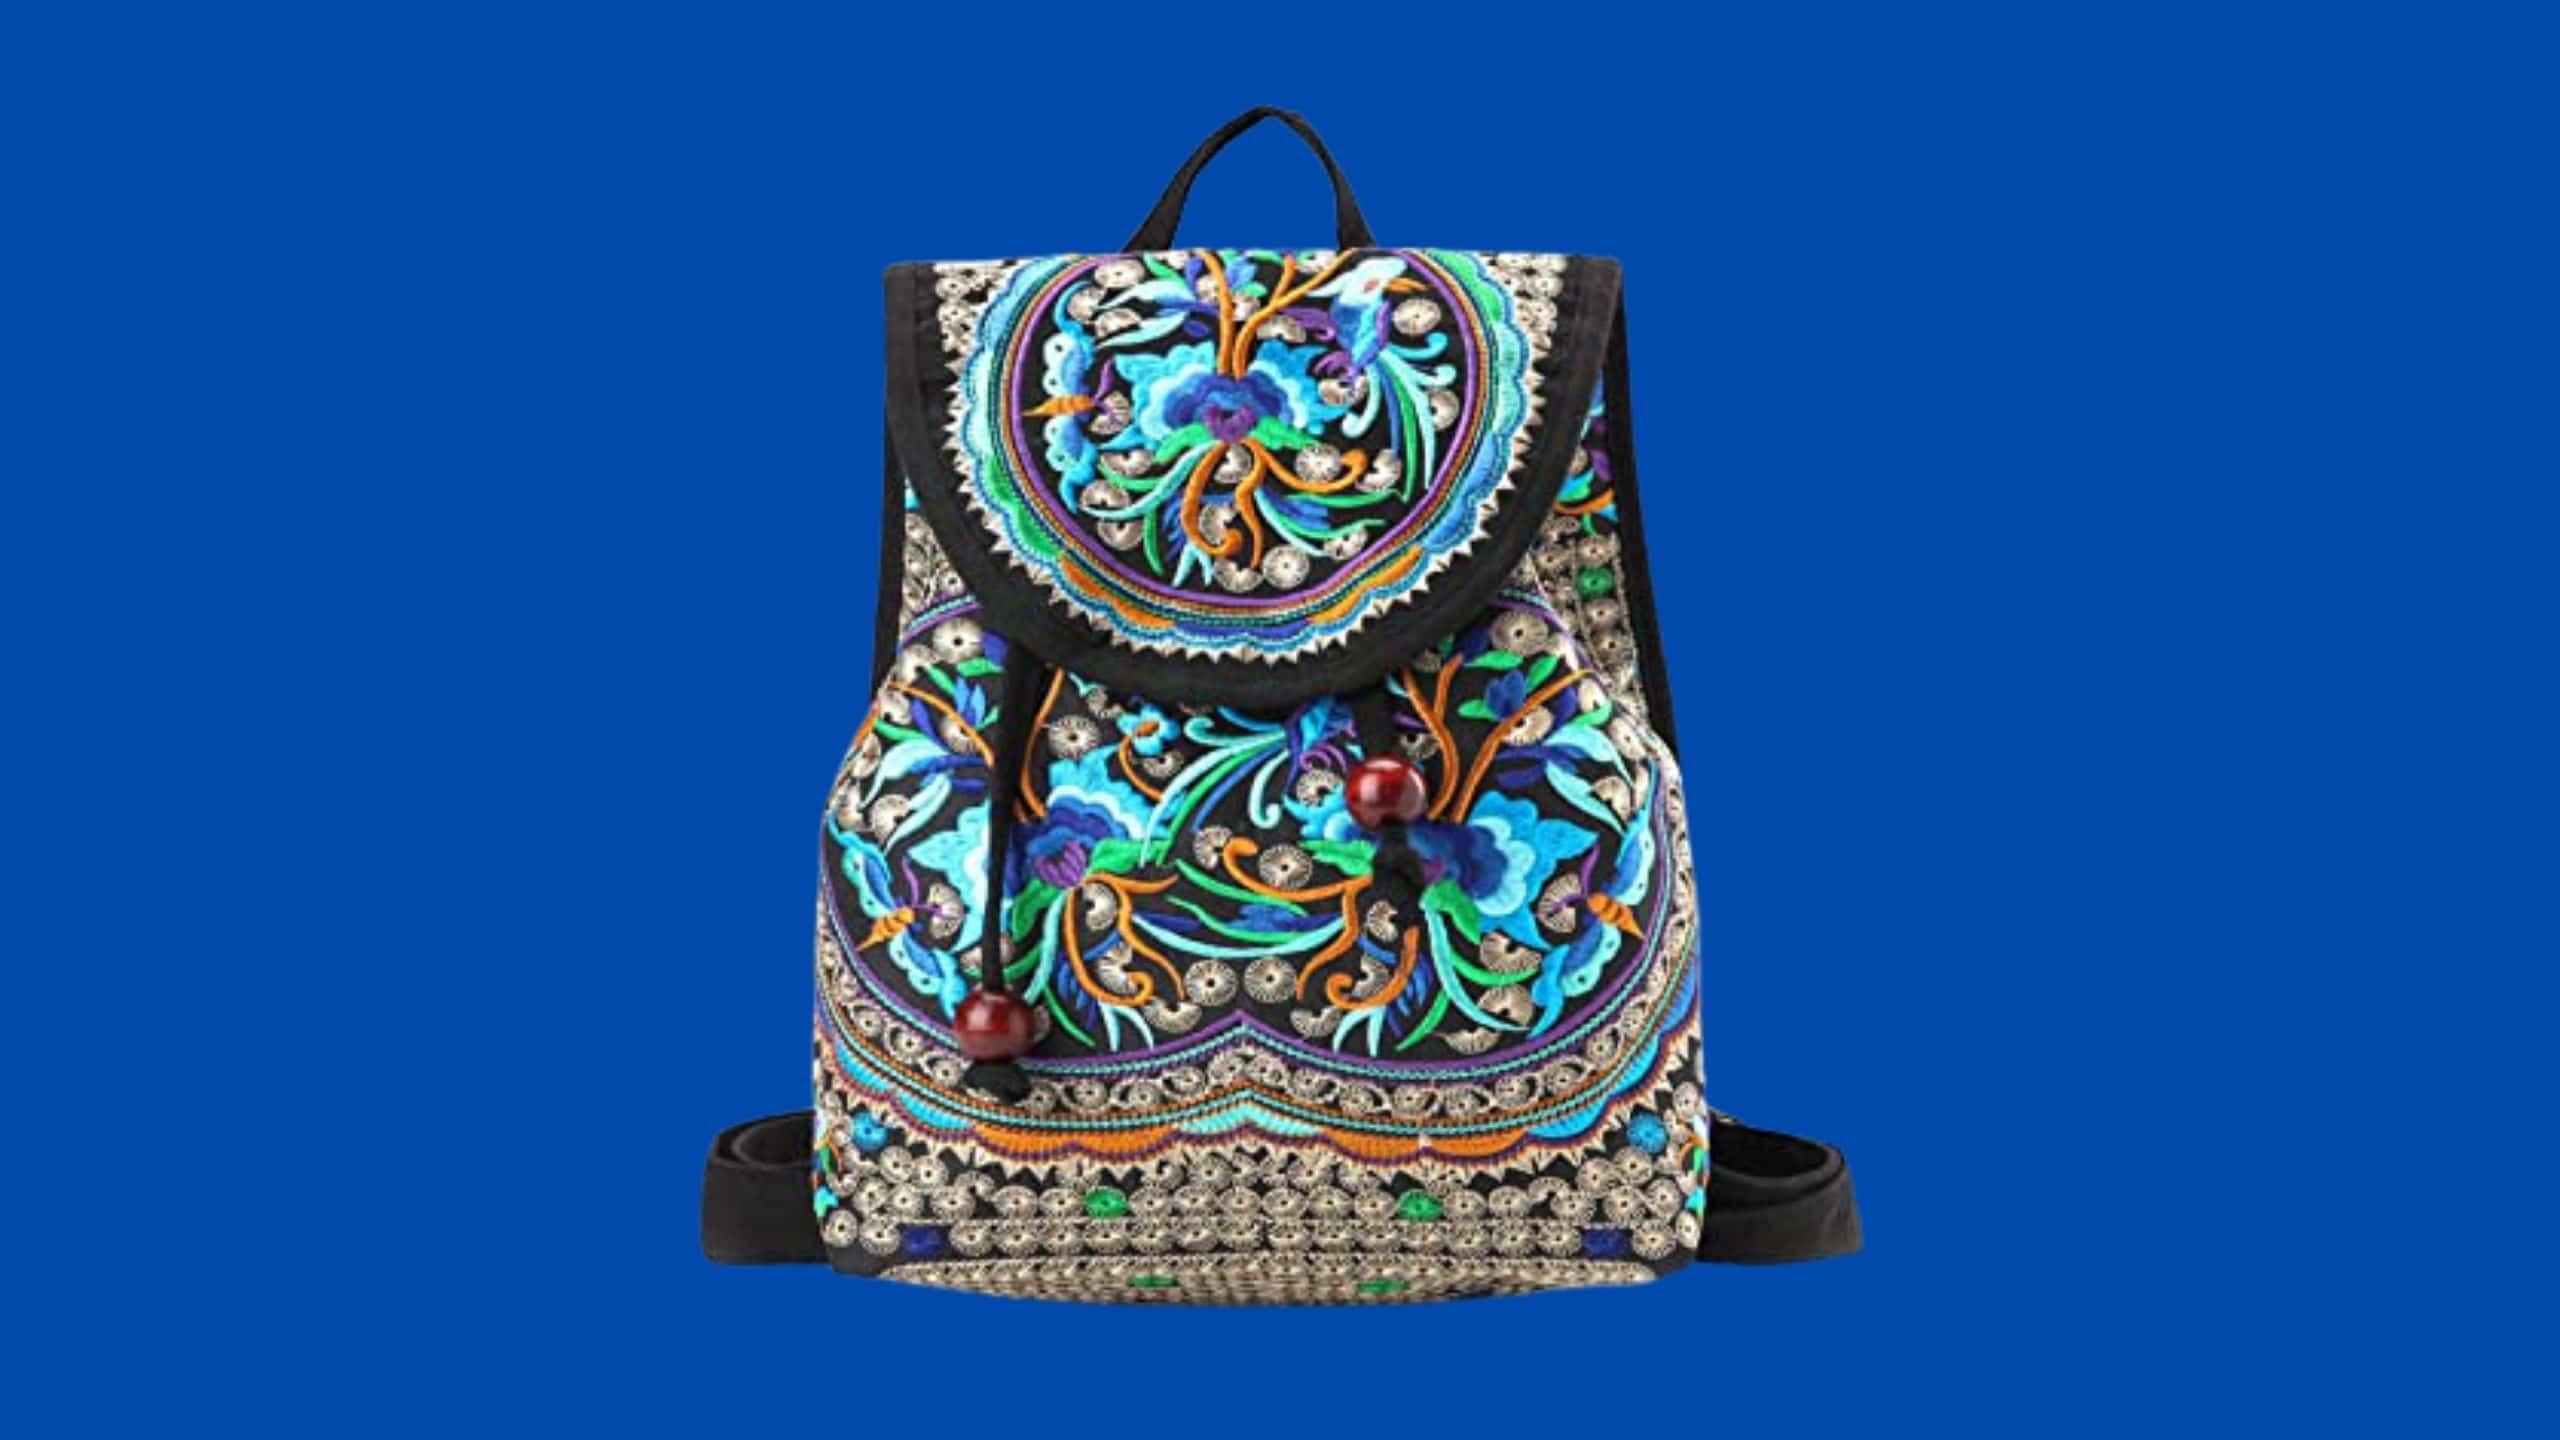 Goodhan Vintage Embroidered Backpack for Music Festivals